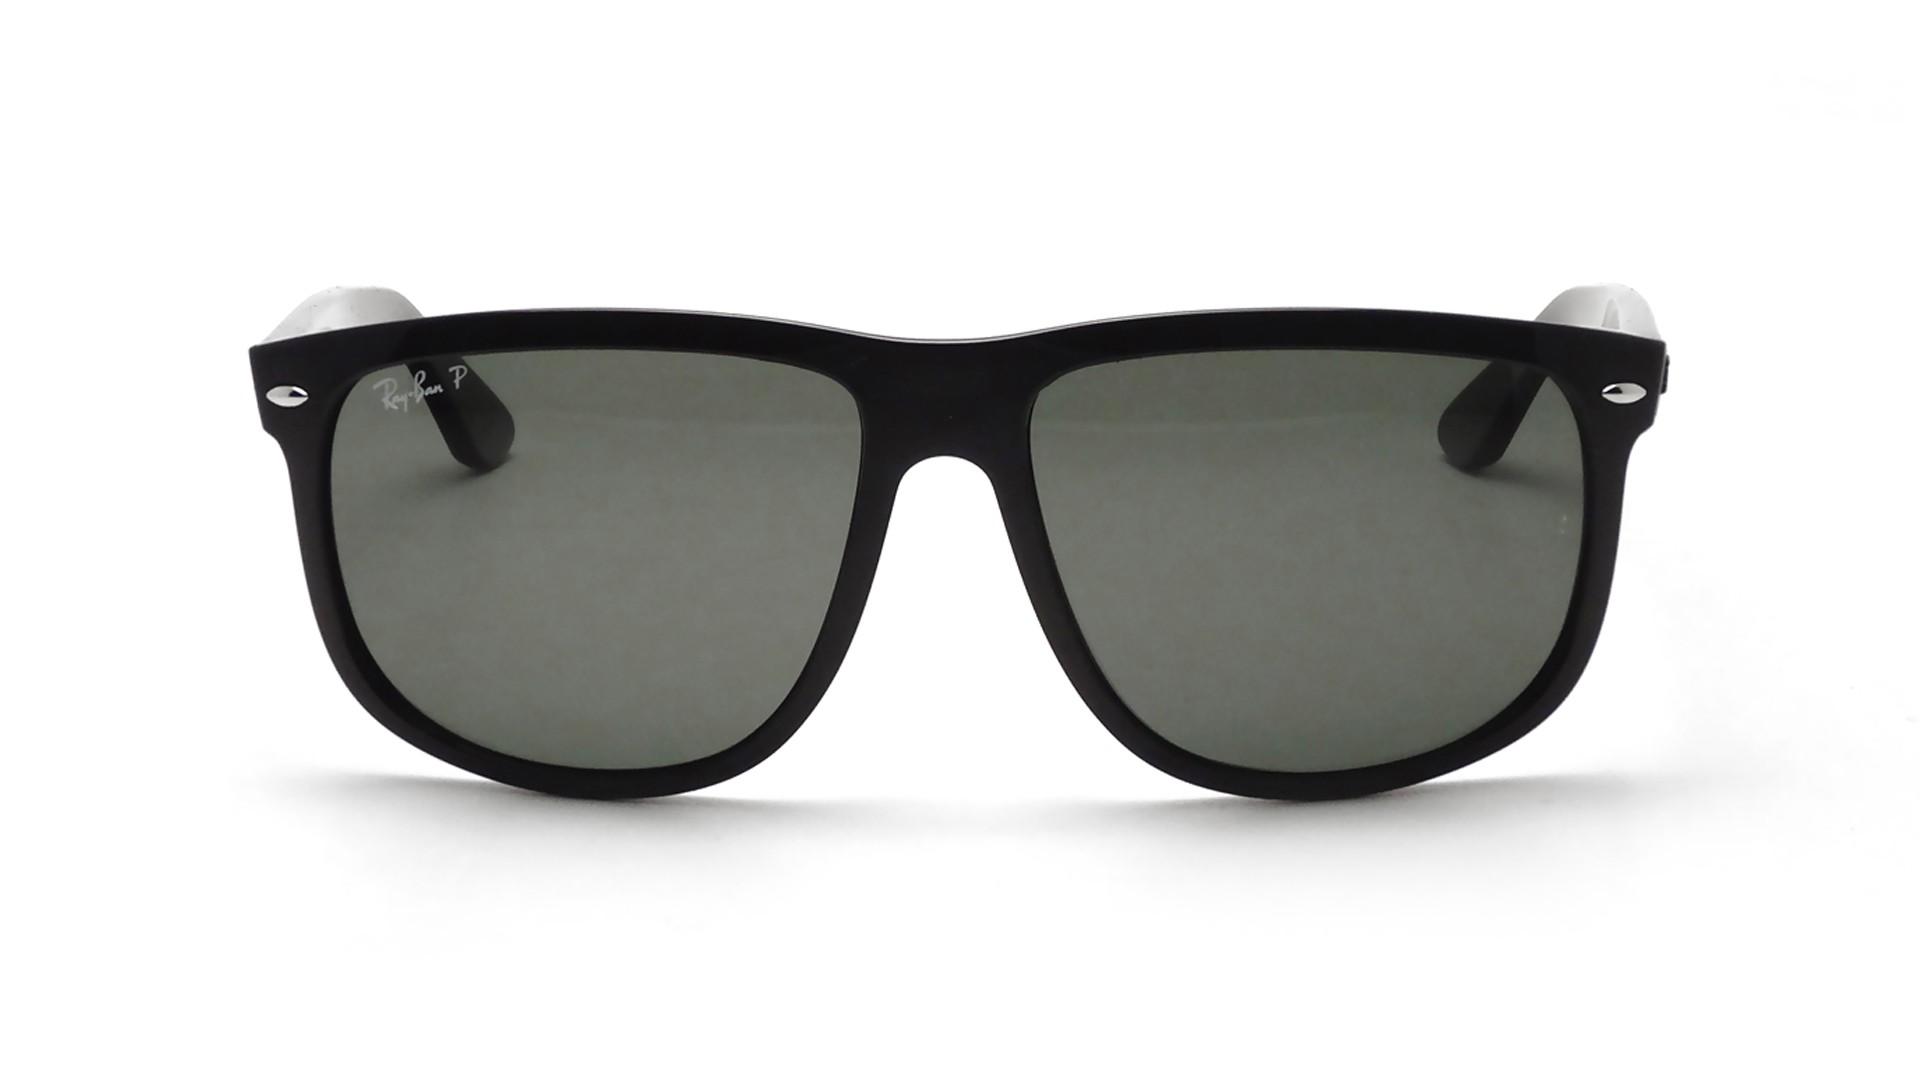 ray ban outlet usa sunglasses